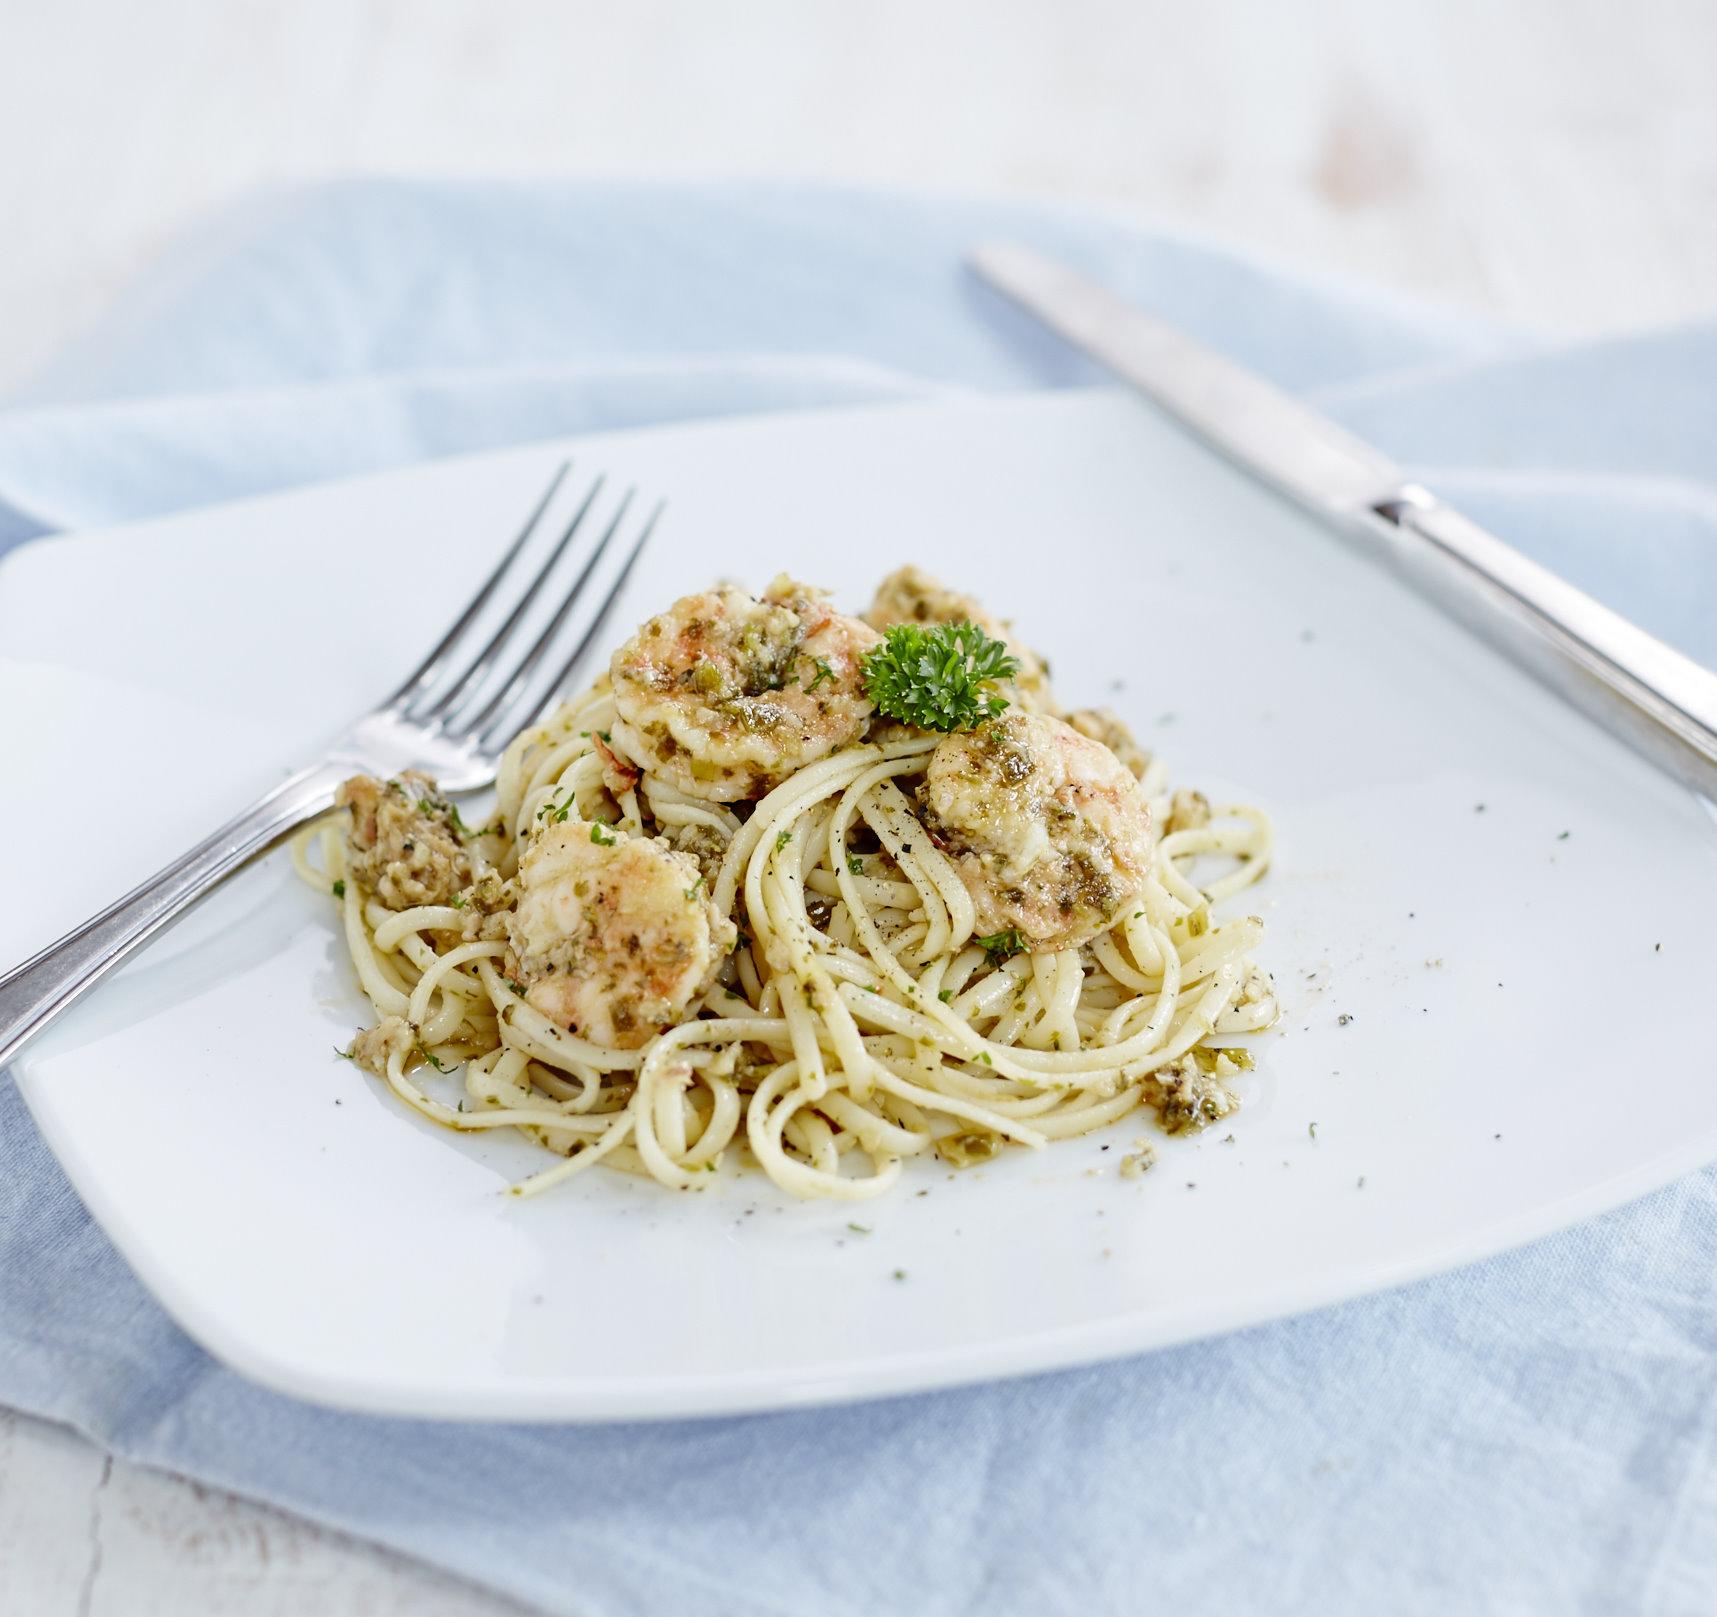 Shrimp with Garlic Sauce on Linguine